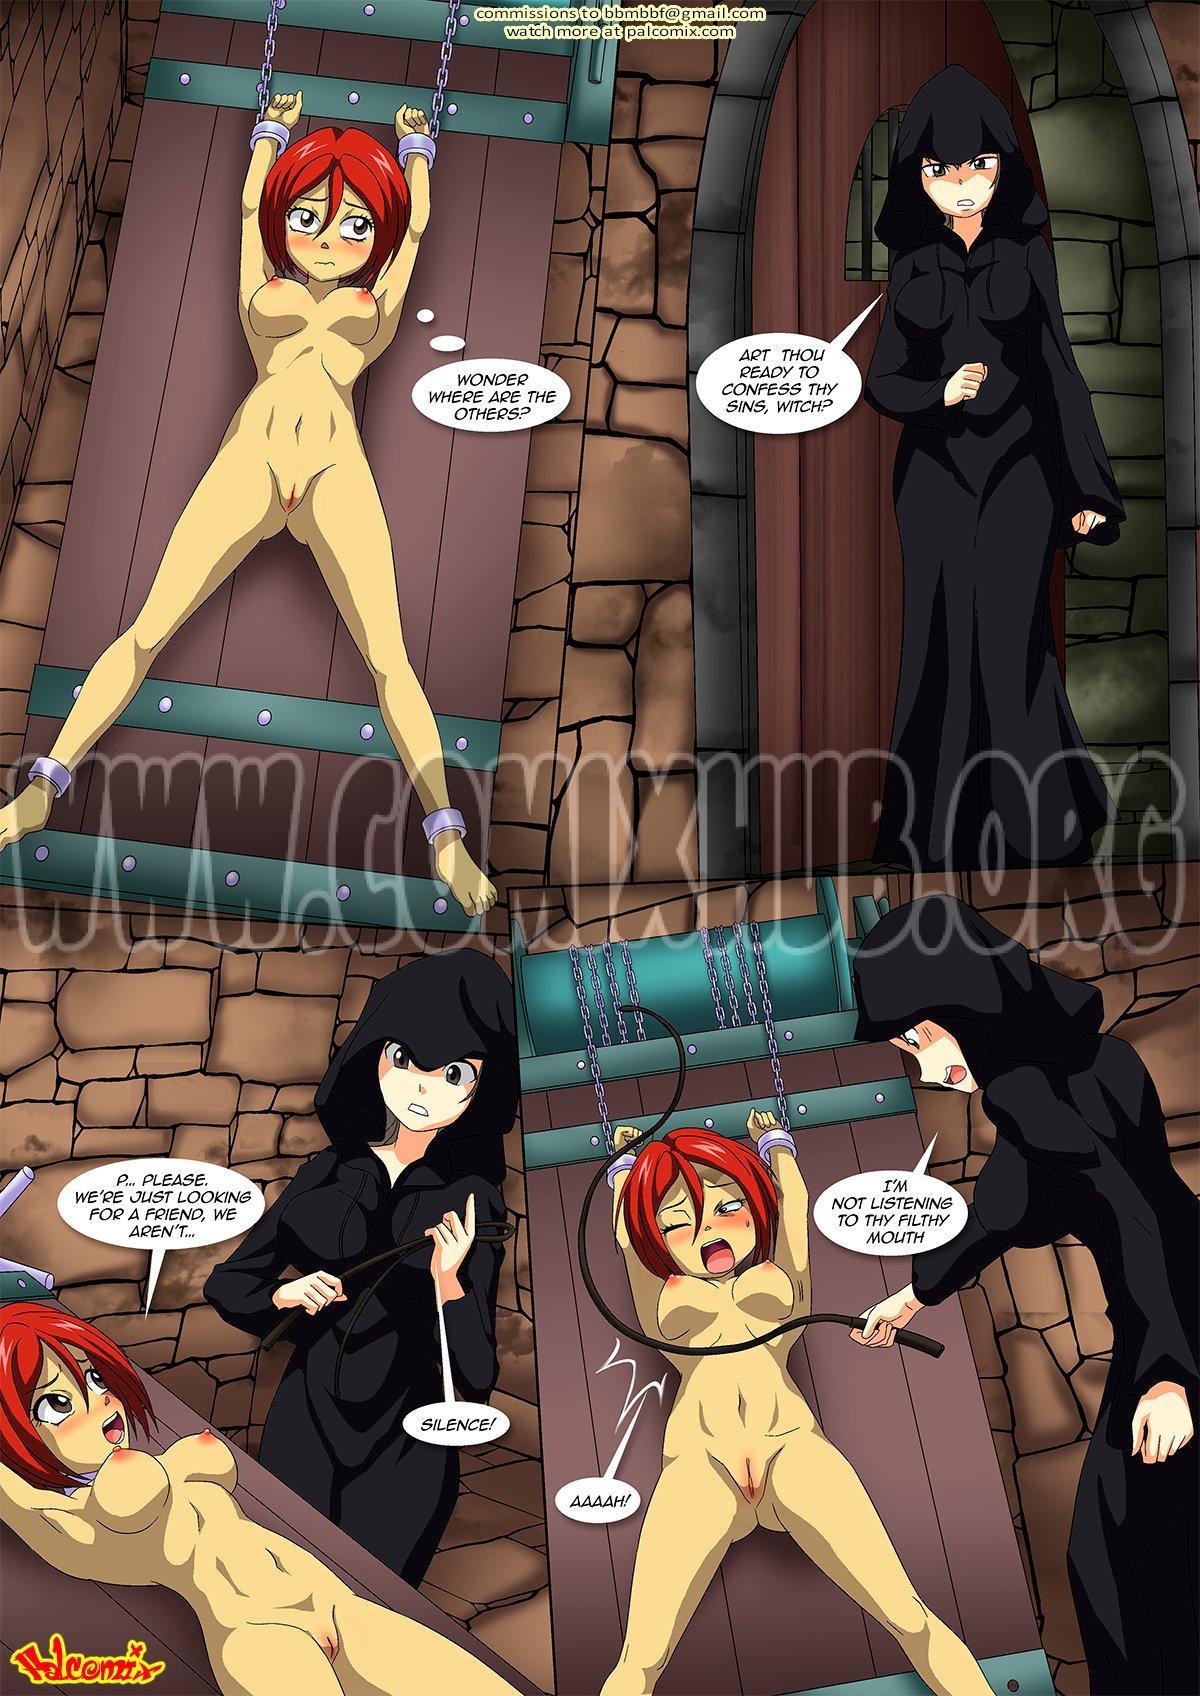 W.I.T.C.H. Inquisition Slaves Straight, BDSM, Bestiality, Fantasy, Rape